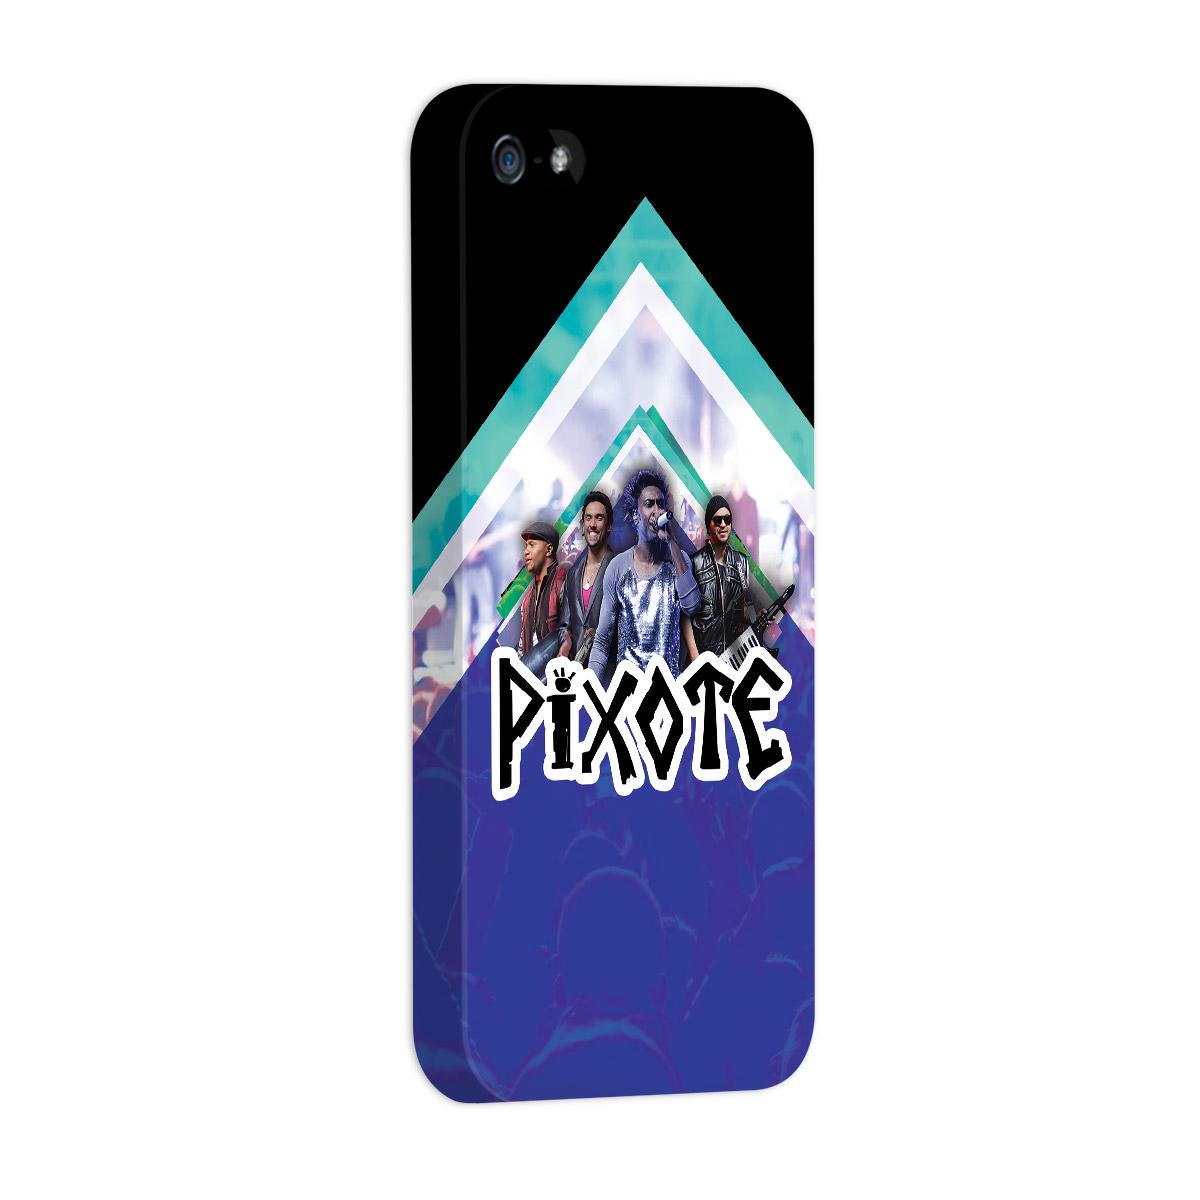 Capa para iPhone 5/5S Pixote Foto